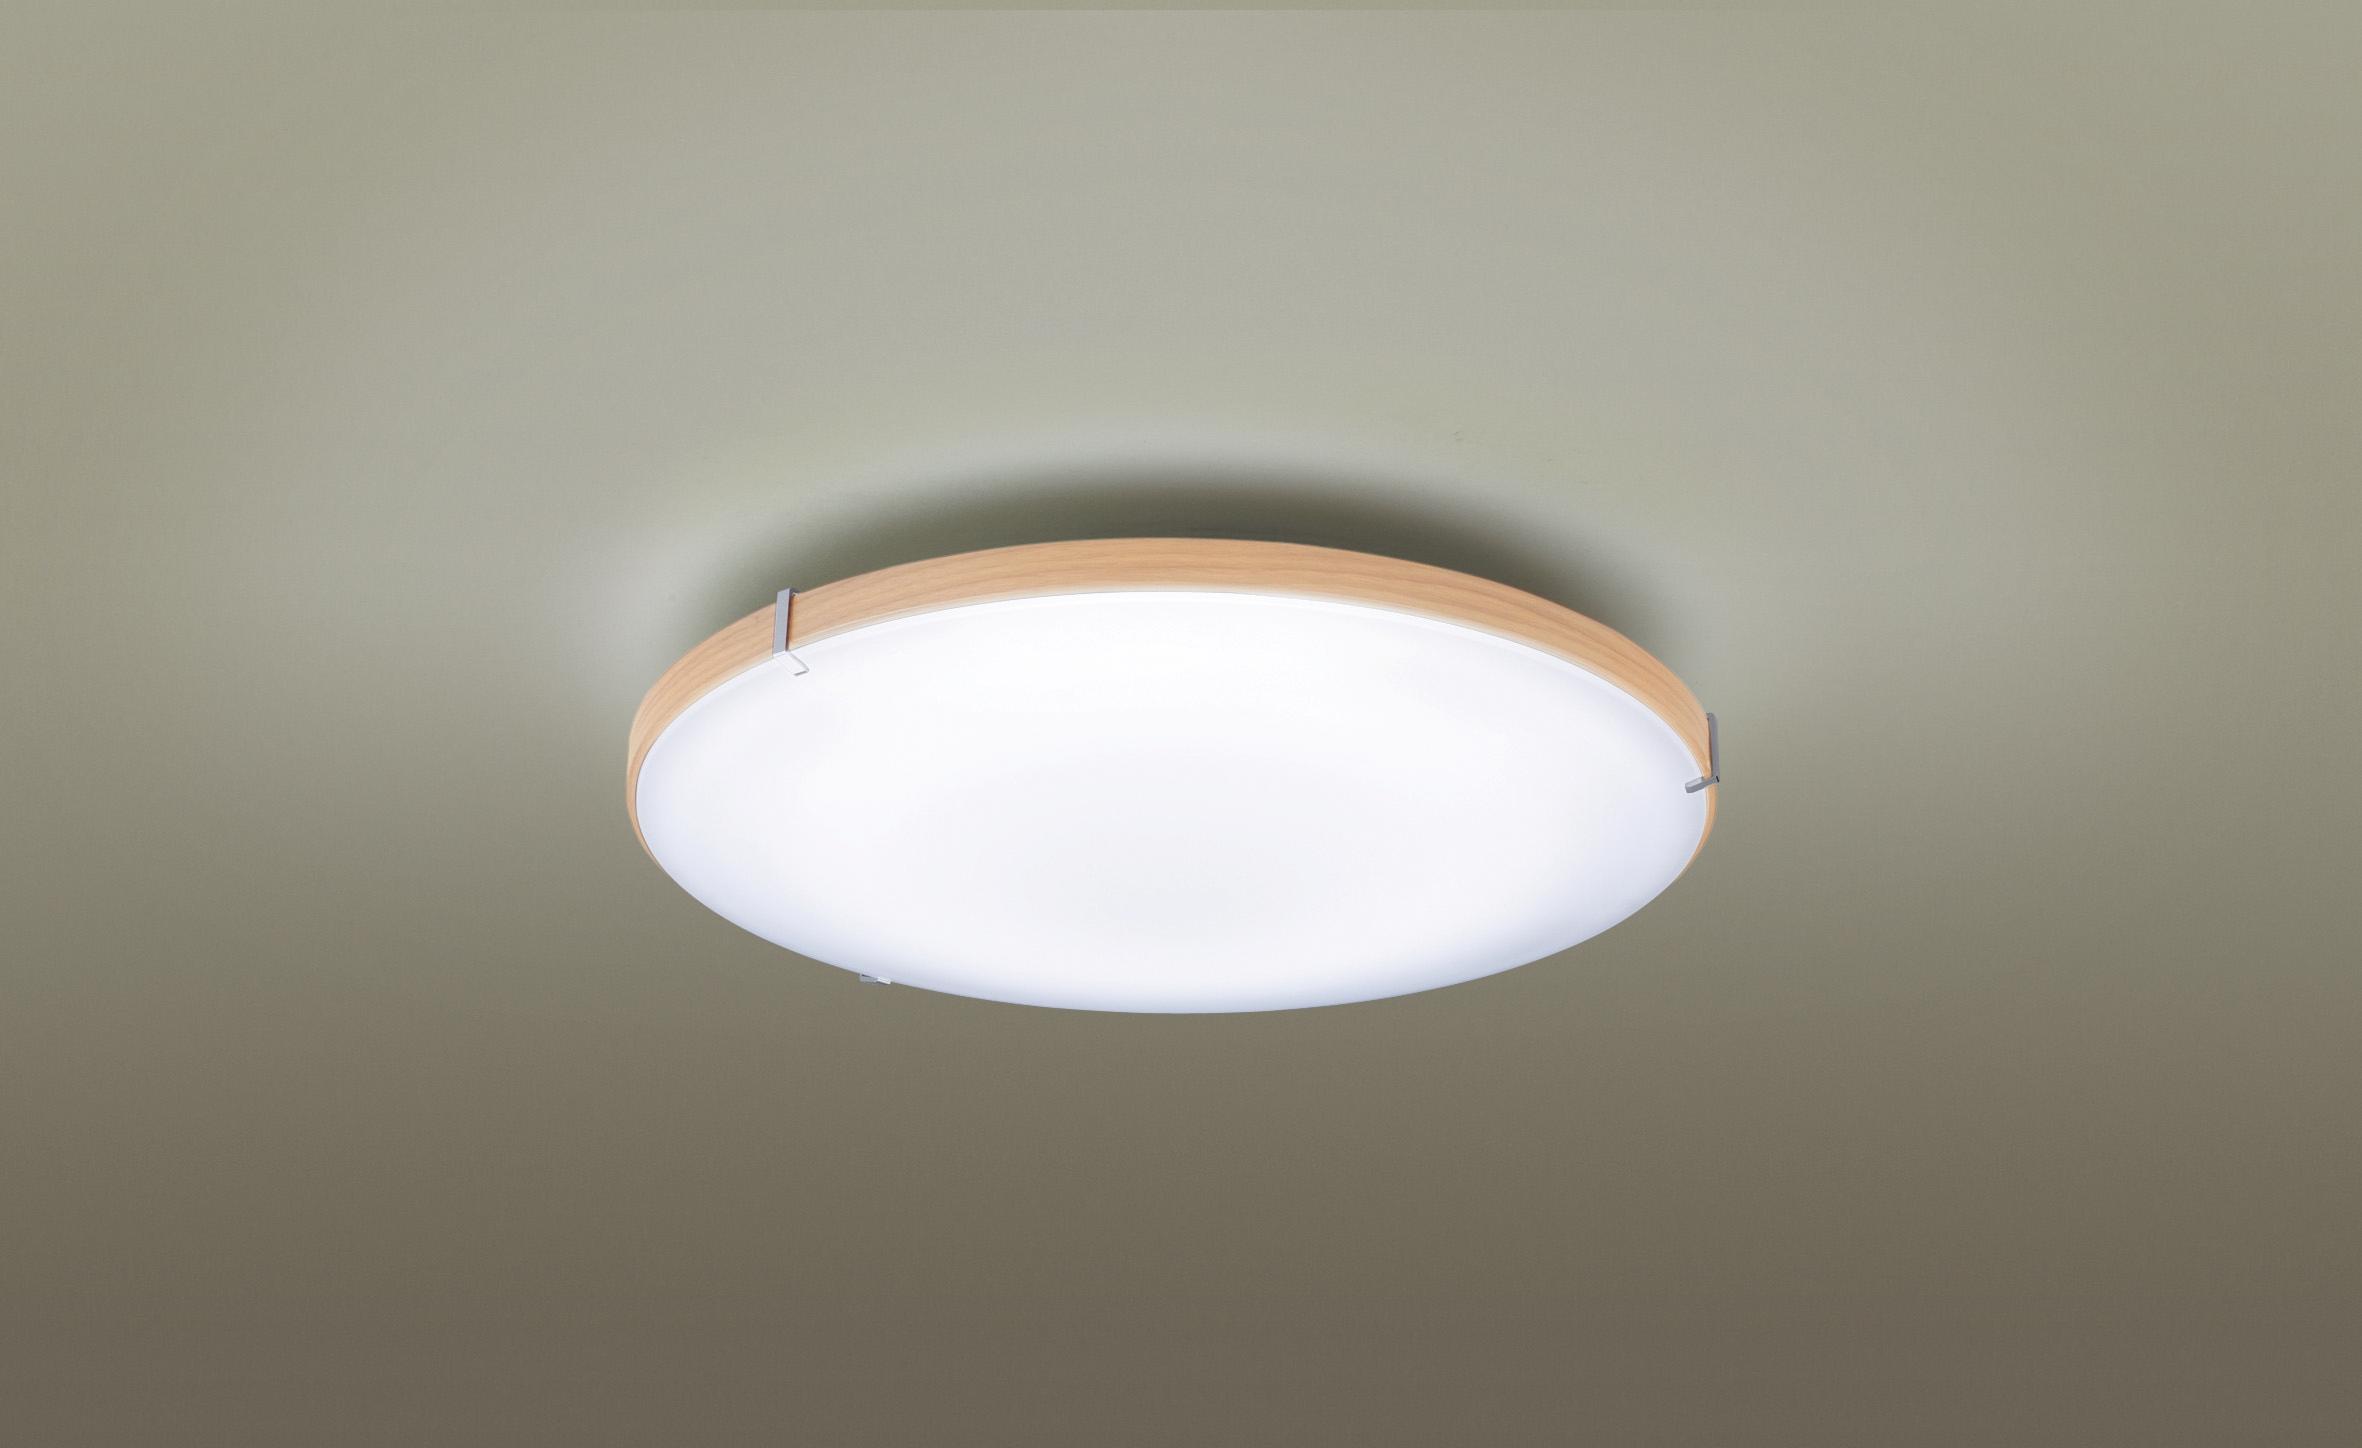 EVERLEDS(エバーレッズ) LEDシーリングライト